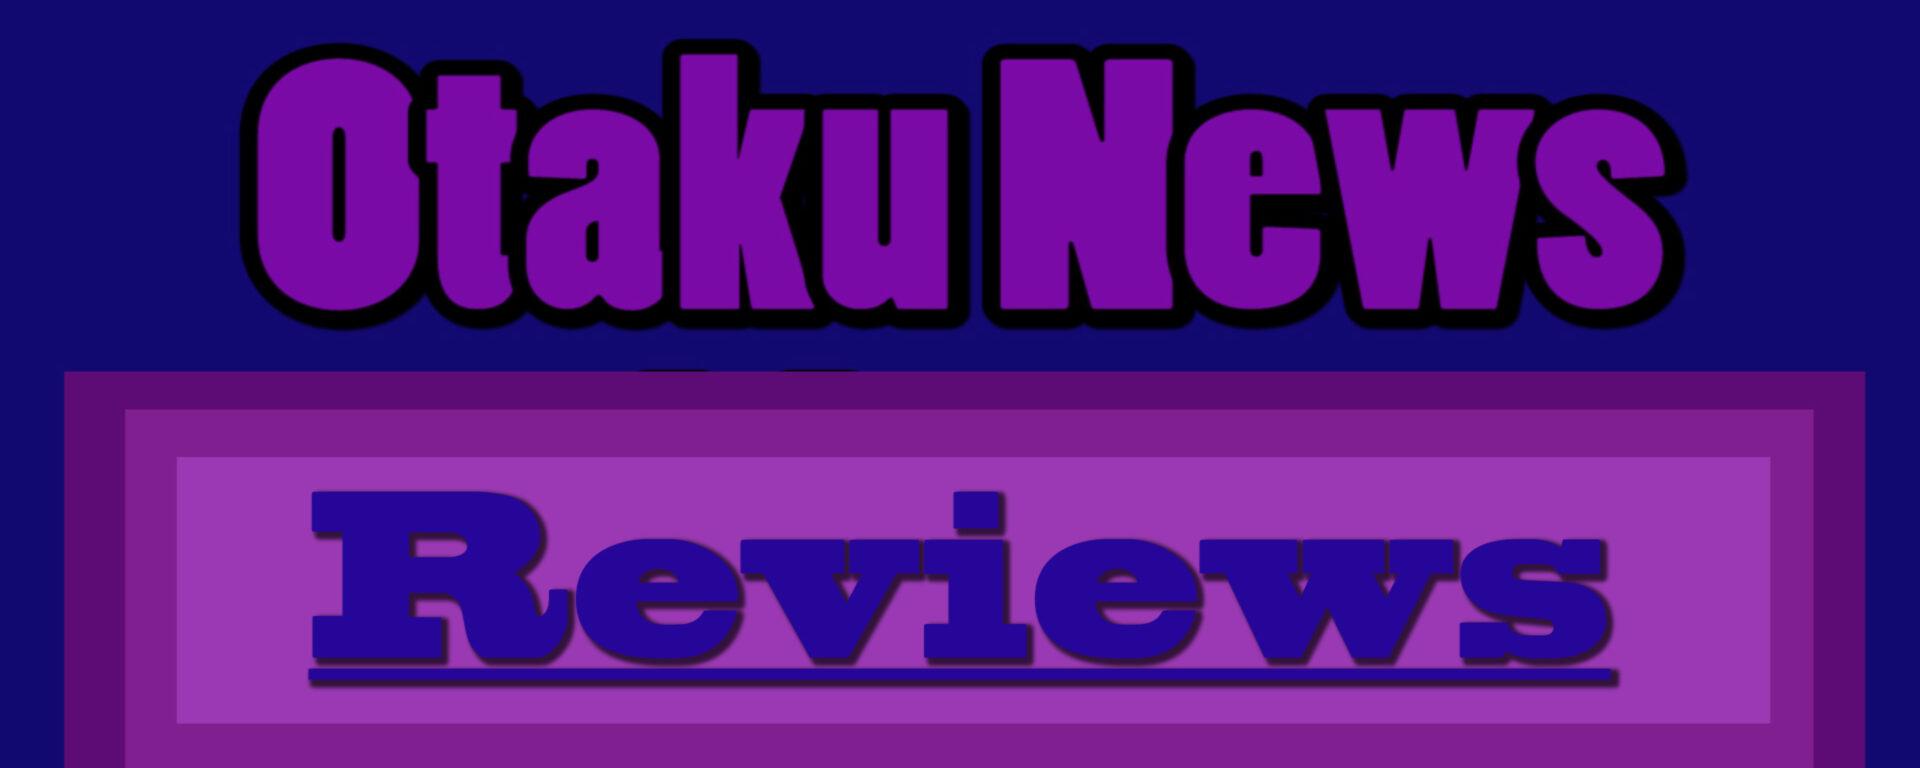 High-Rise Invasion – Otaku News Reviews